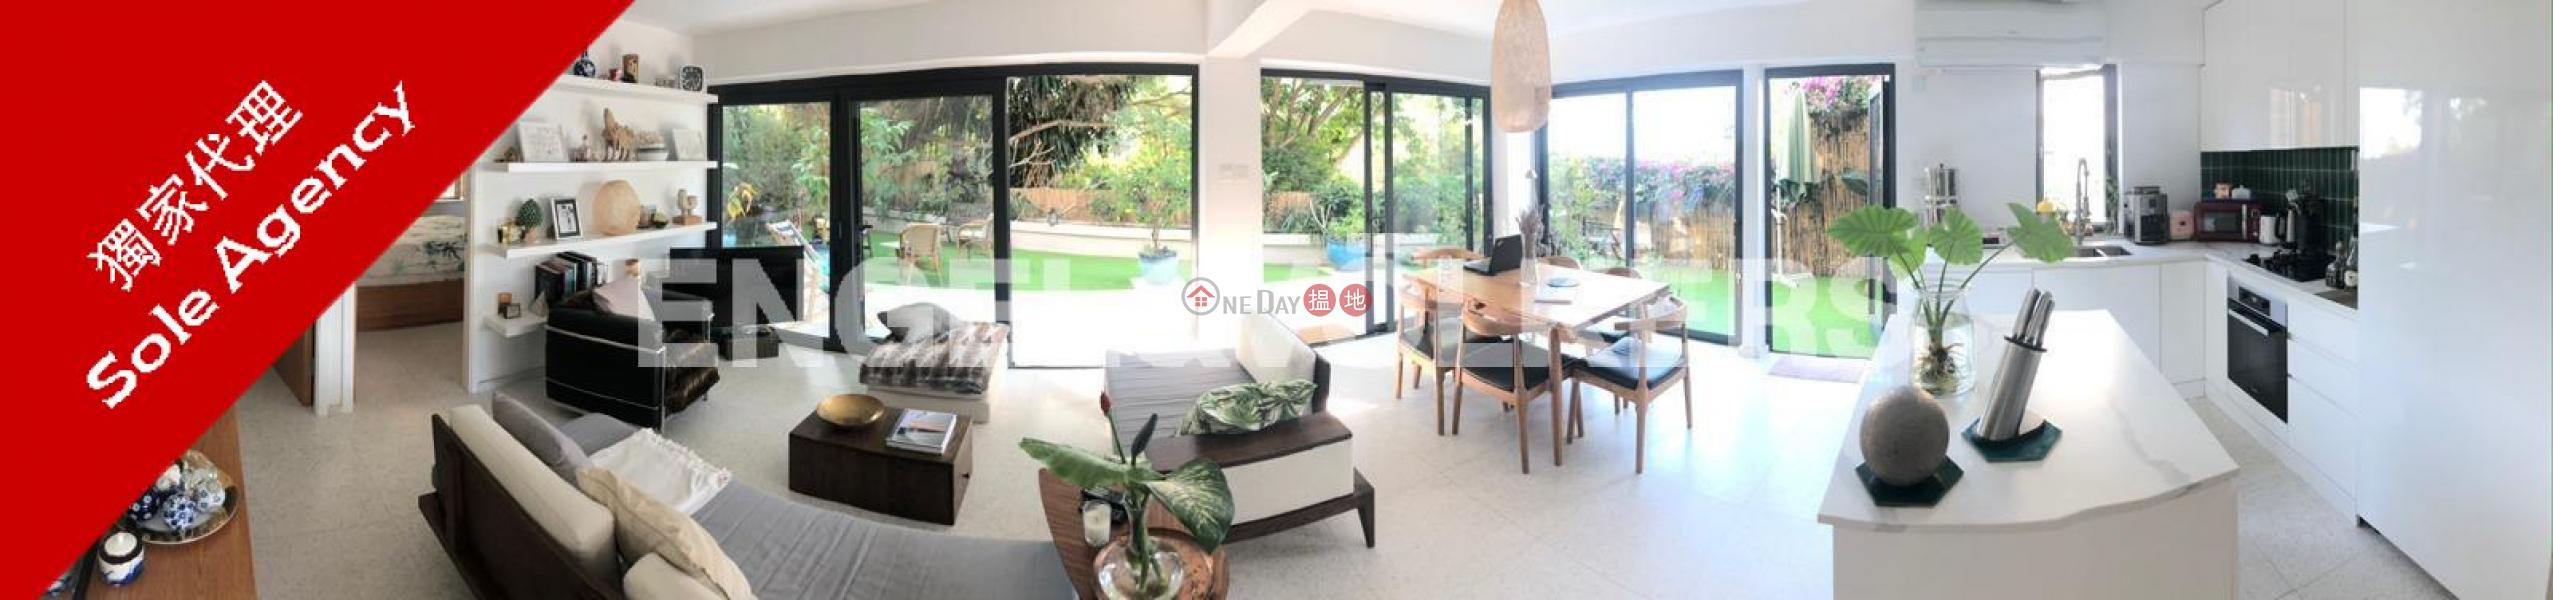 2 Bedroom Flat for Sale in Yung Shue Wan, Po Wah Yuen 寶華園 Sales Listings | Lamma Island (EVHK98557)